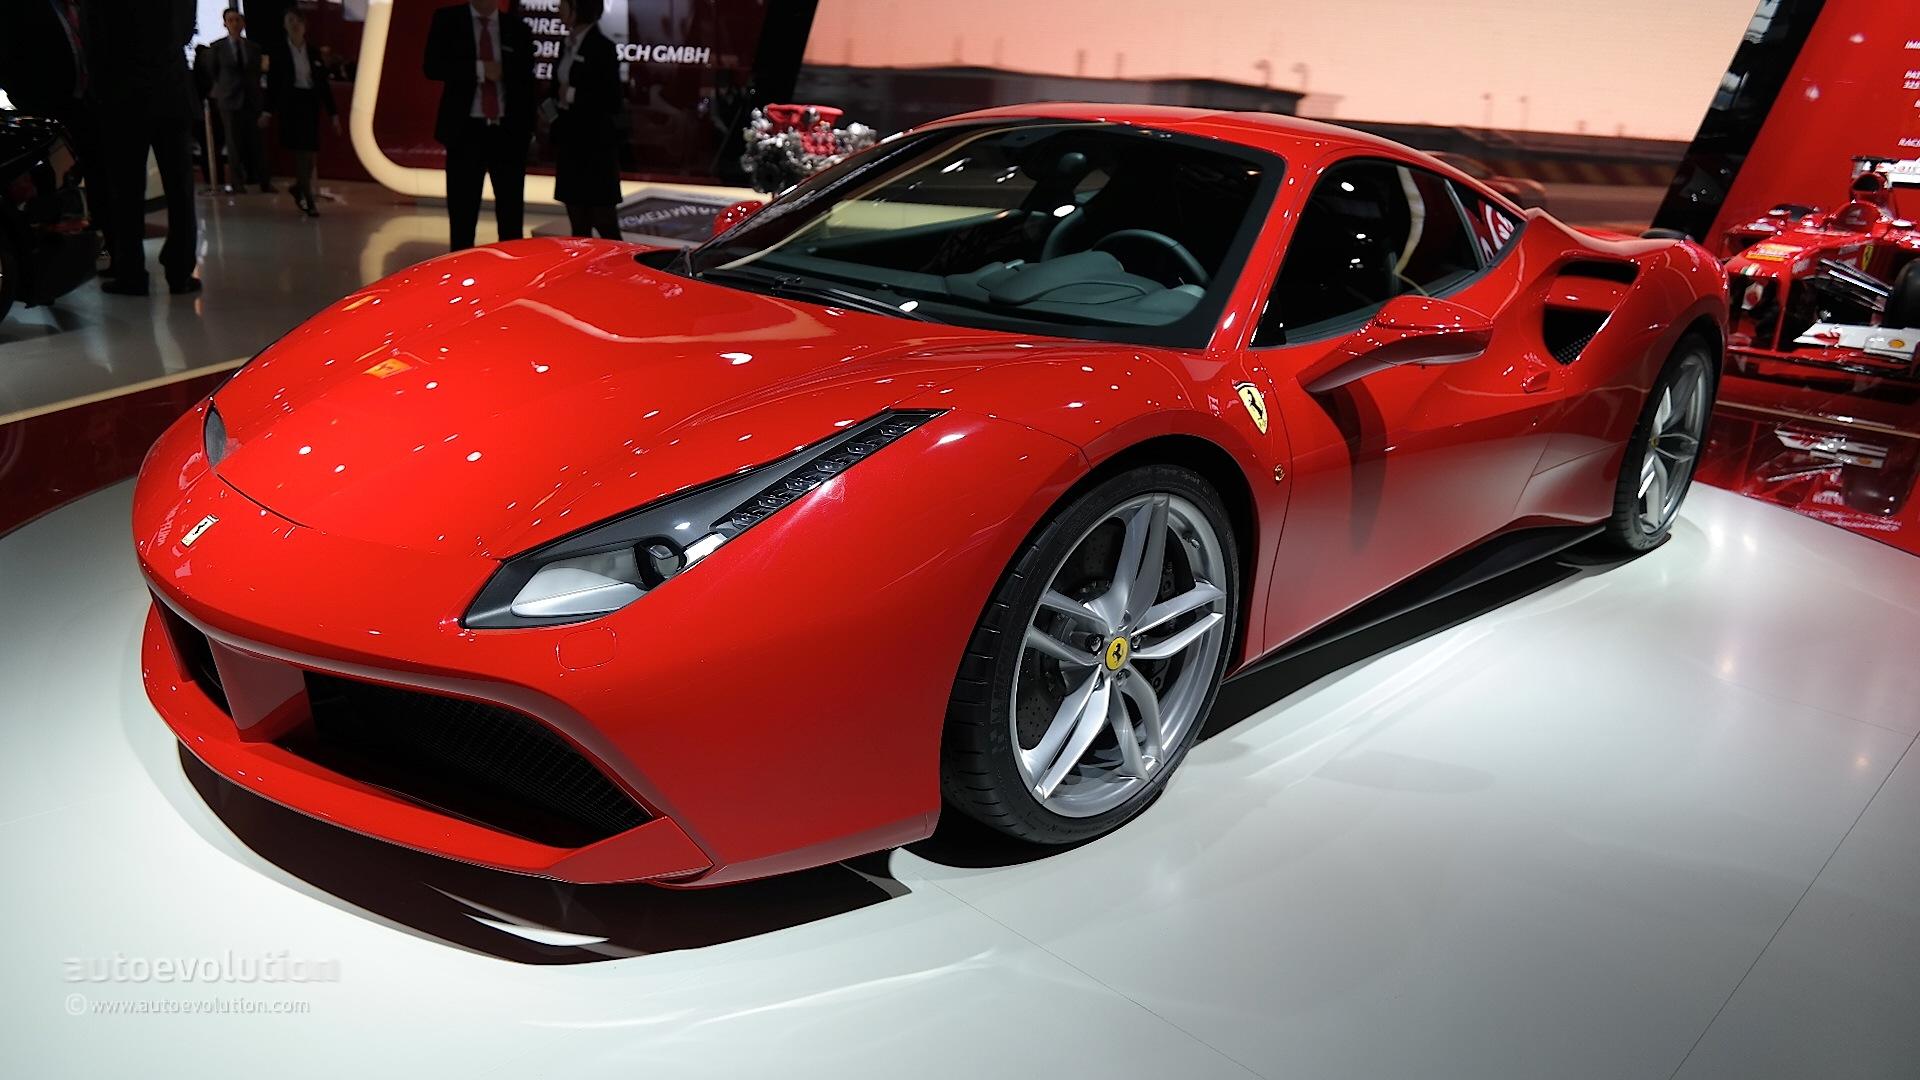 Ferrari 488 GTB Joined by 3.9L Twin-Turbo V8 Display at Auto ...